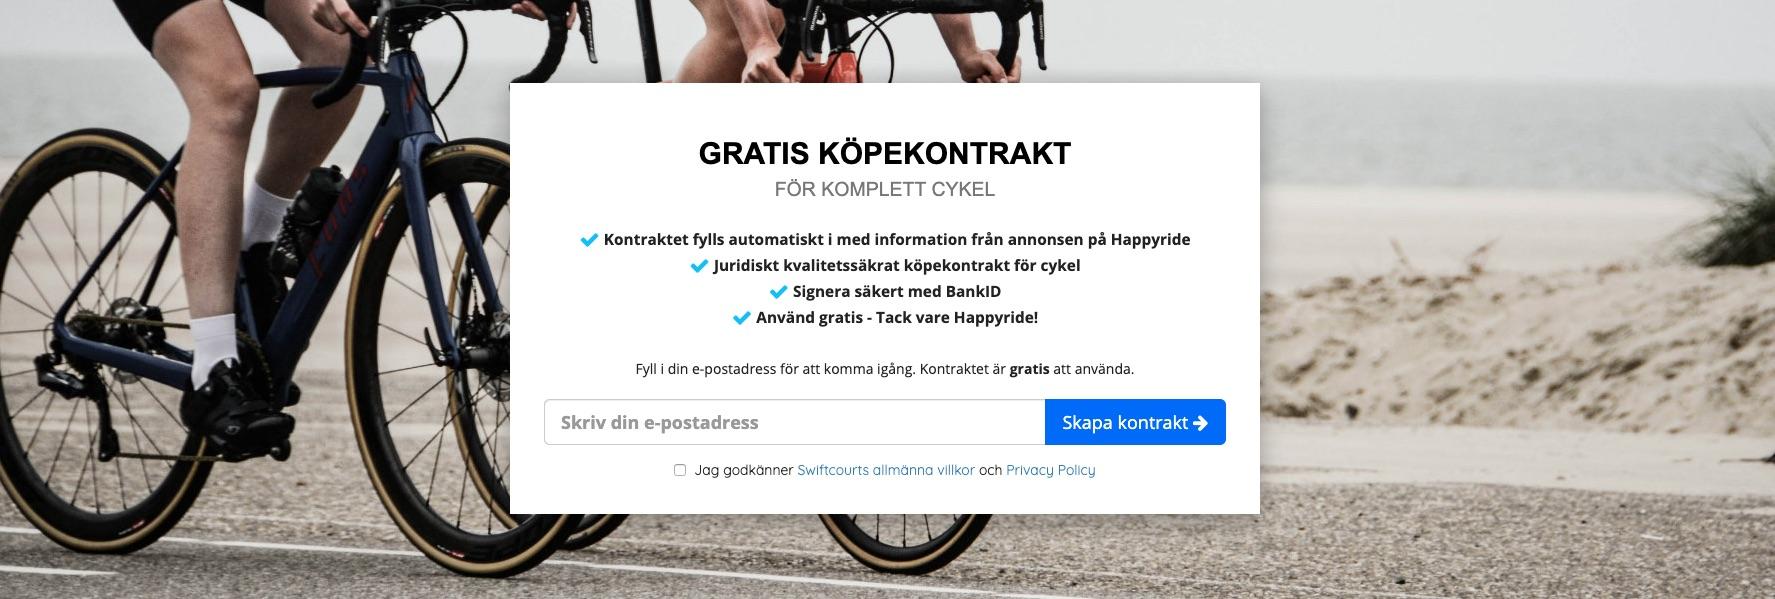 digitala-kopekontrakt-happyride.jpg